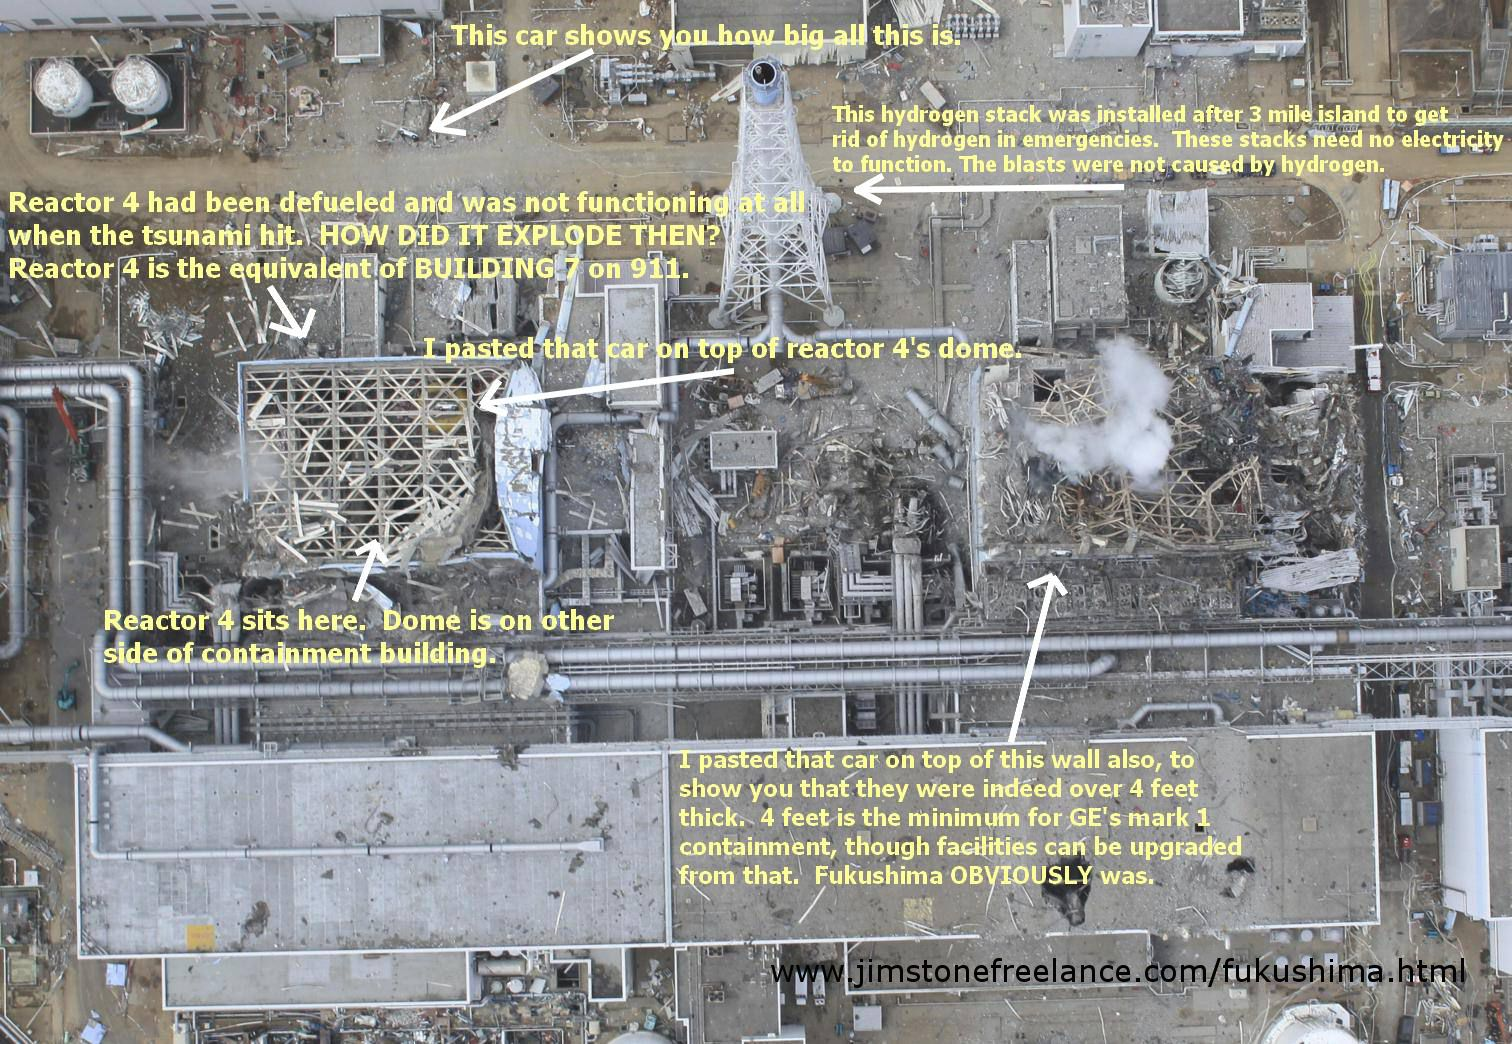 magyarmegmaradasert.hu/images/stories/kep-1/Fukushima/fukushima_felulrol.jpg